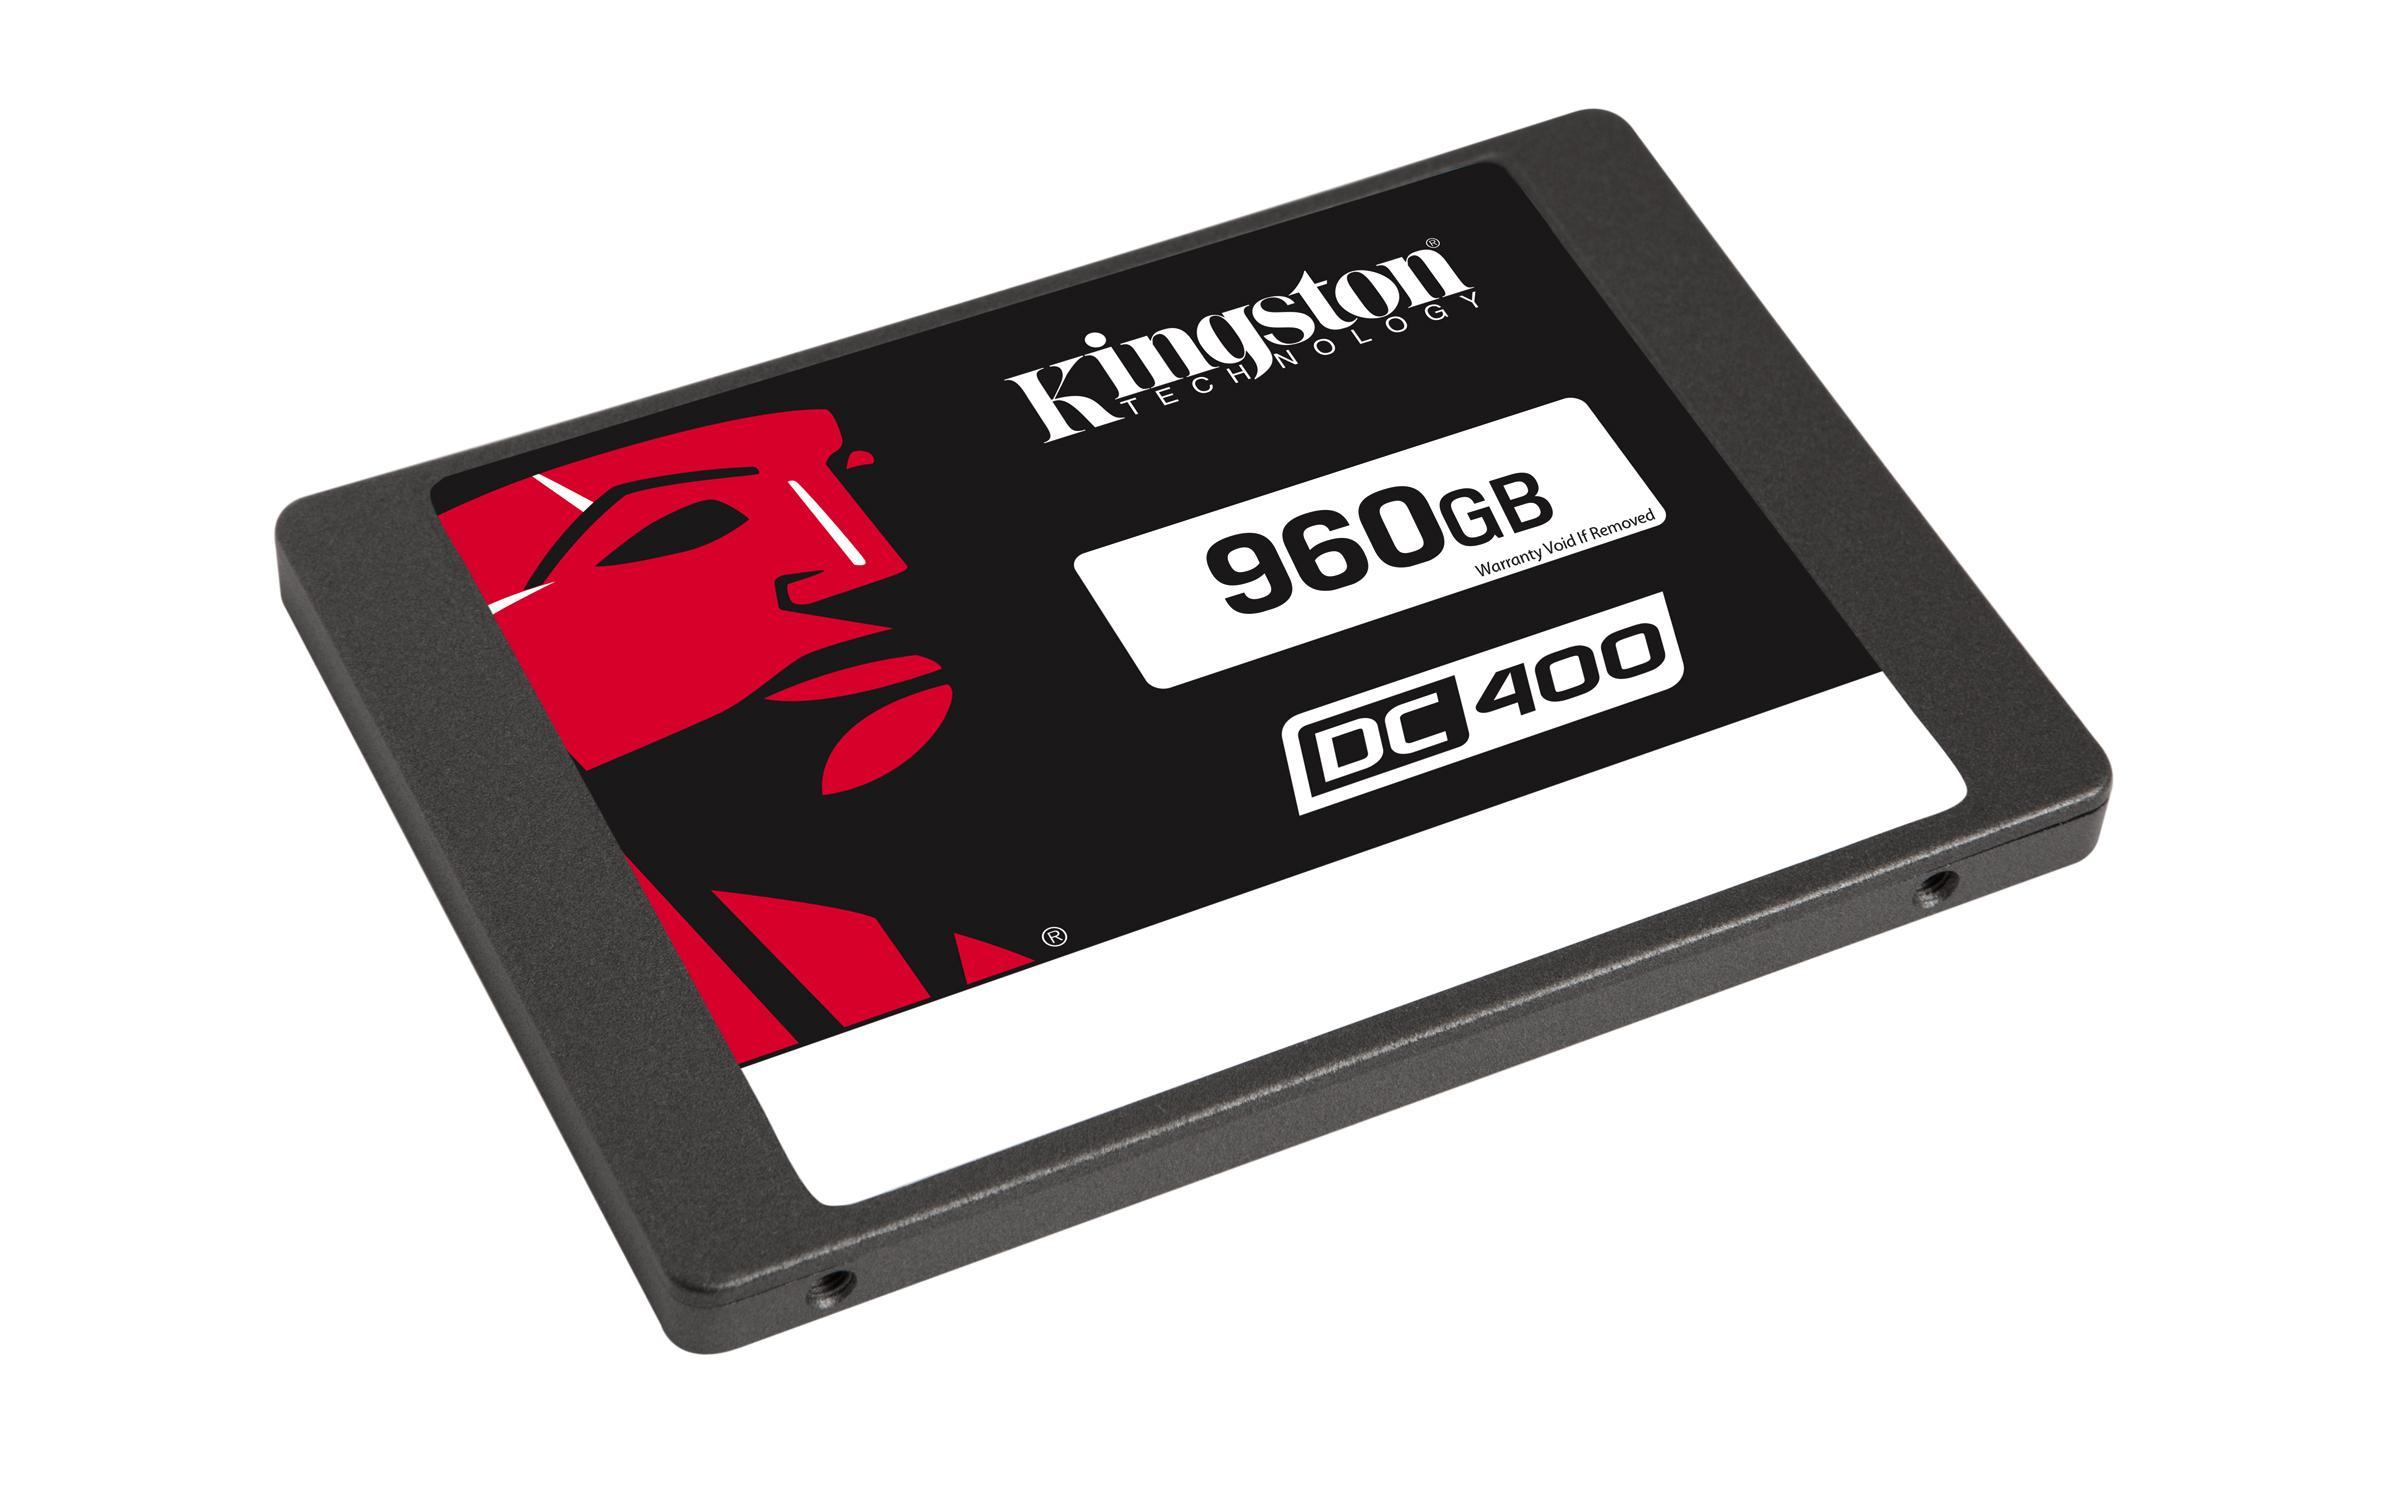 960GB Kingston DC400 SSD SATA 3 2.5 7mm